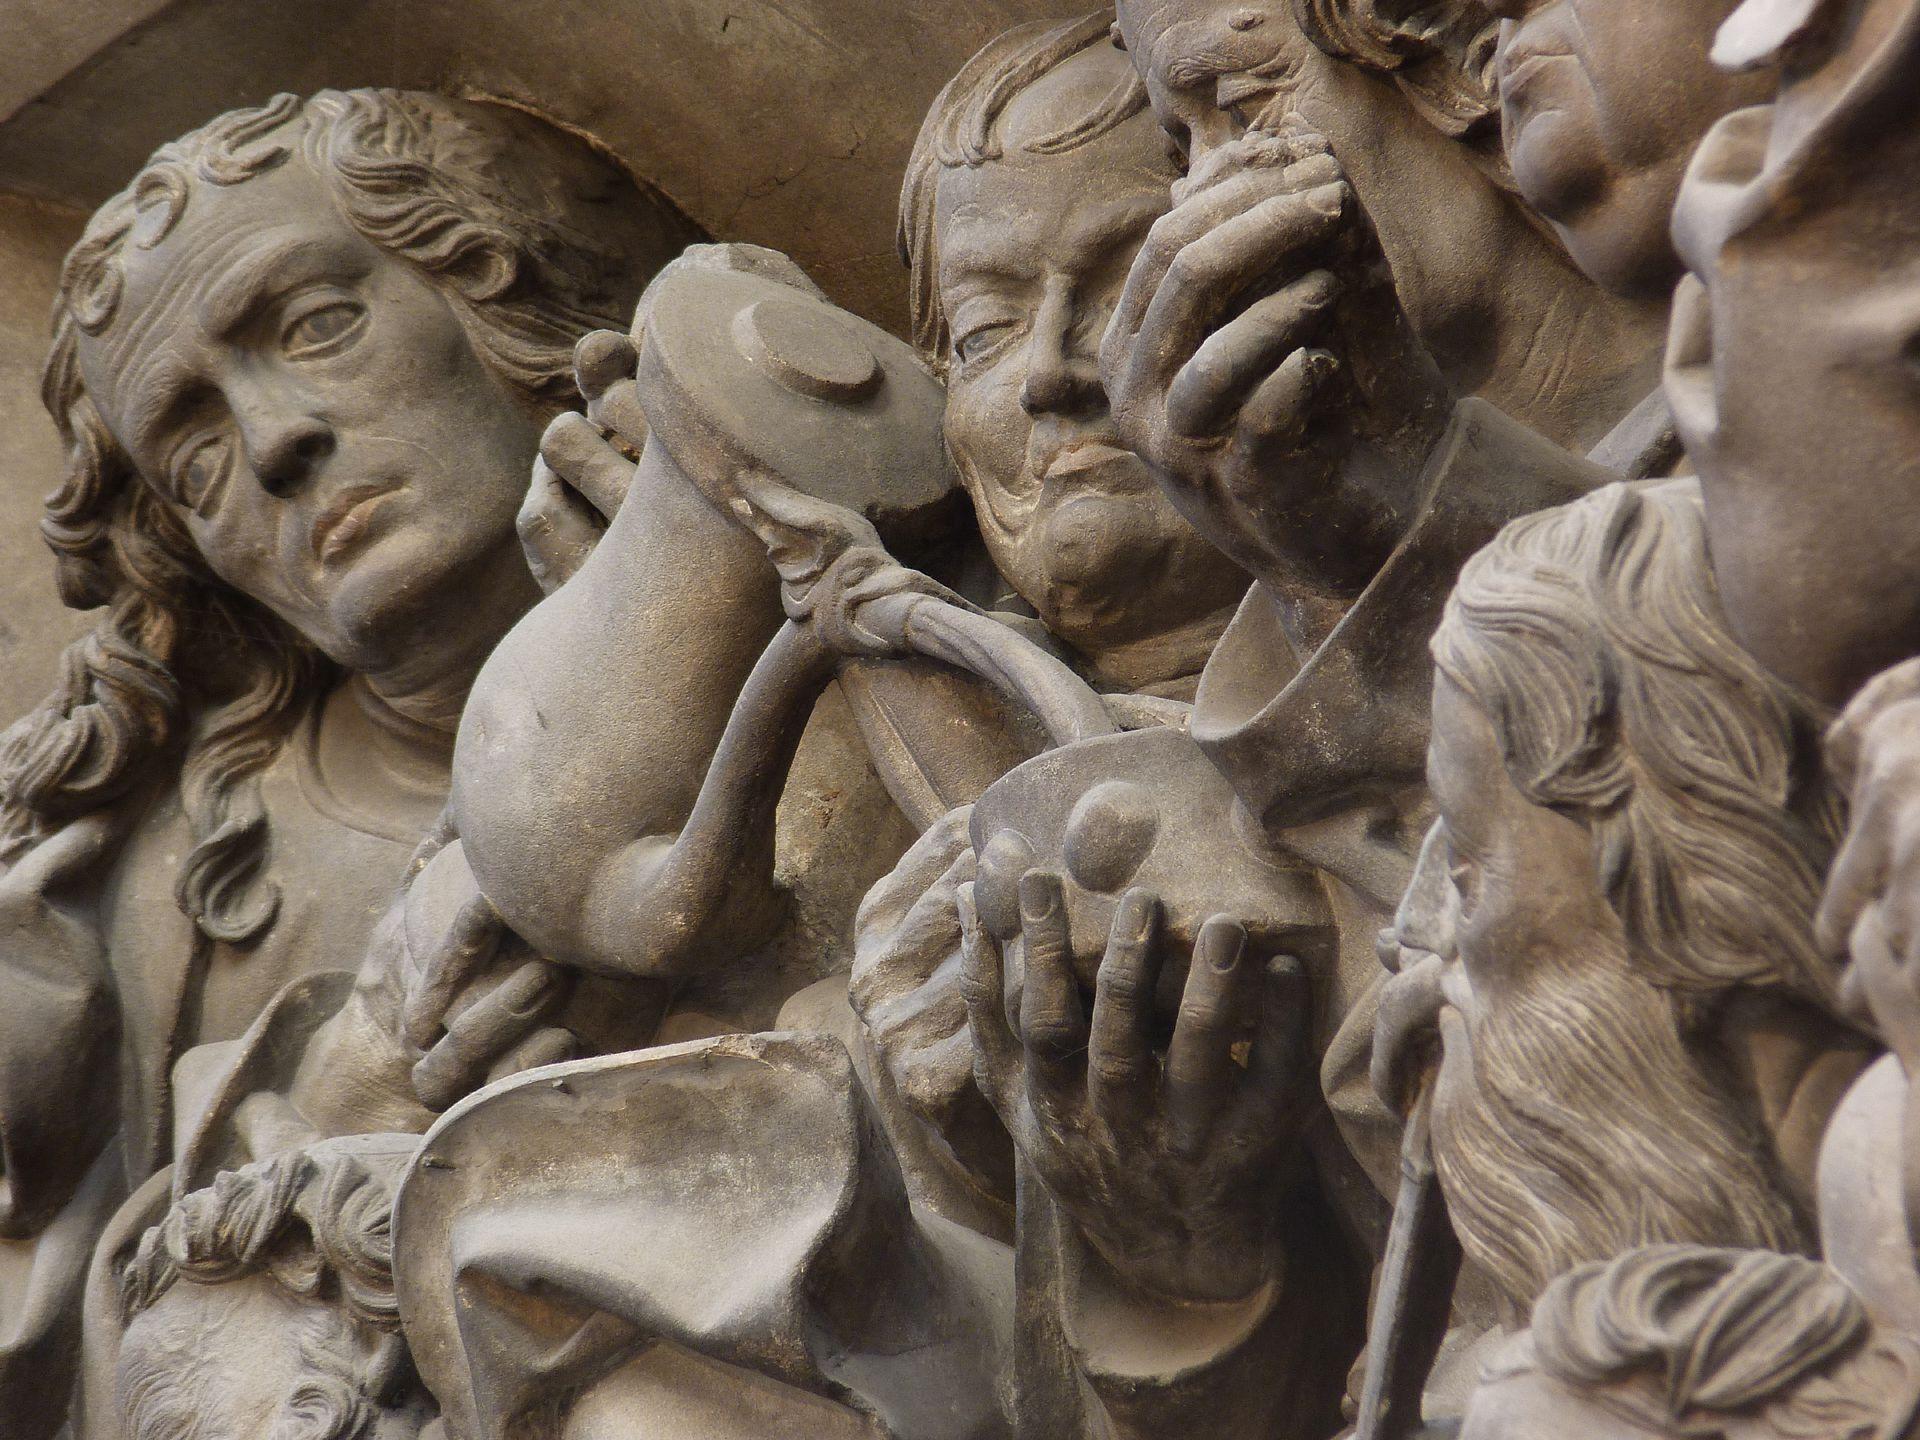 Volckamersche Gedächtsnisstiftung, Reliefplatten Letztes Abendmahl, Detail: Apostelgruppe mit Weinausschank